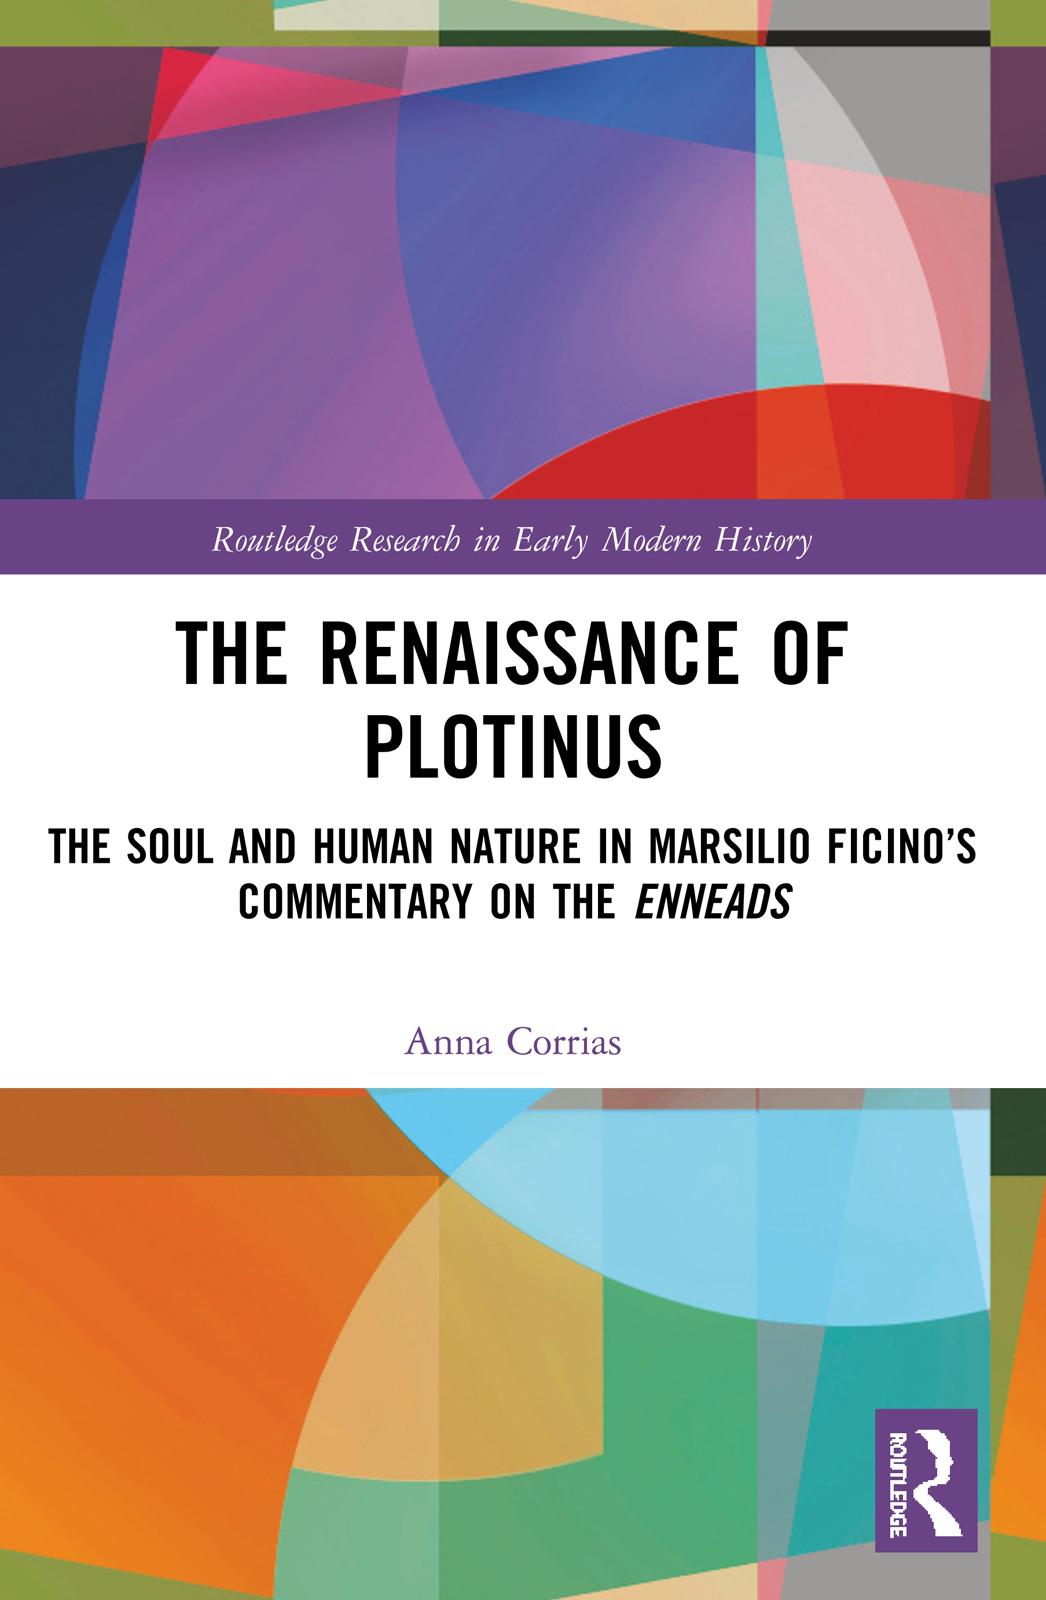 The Renaissance of Plotinus